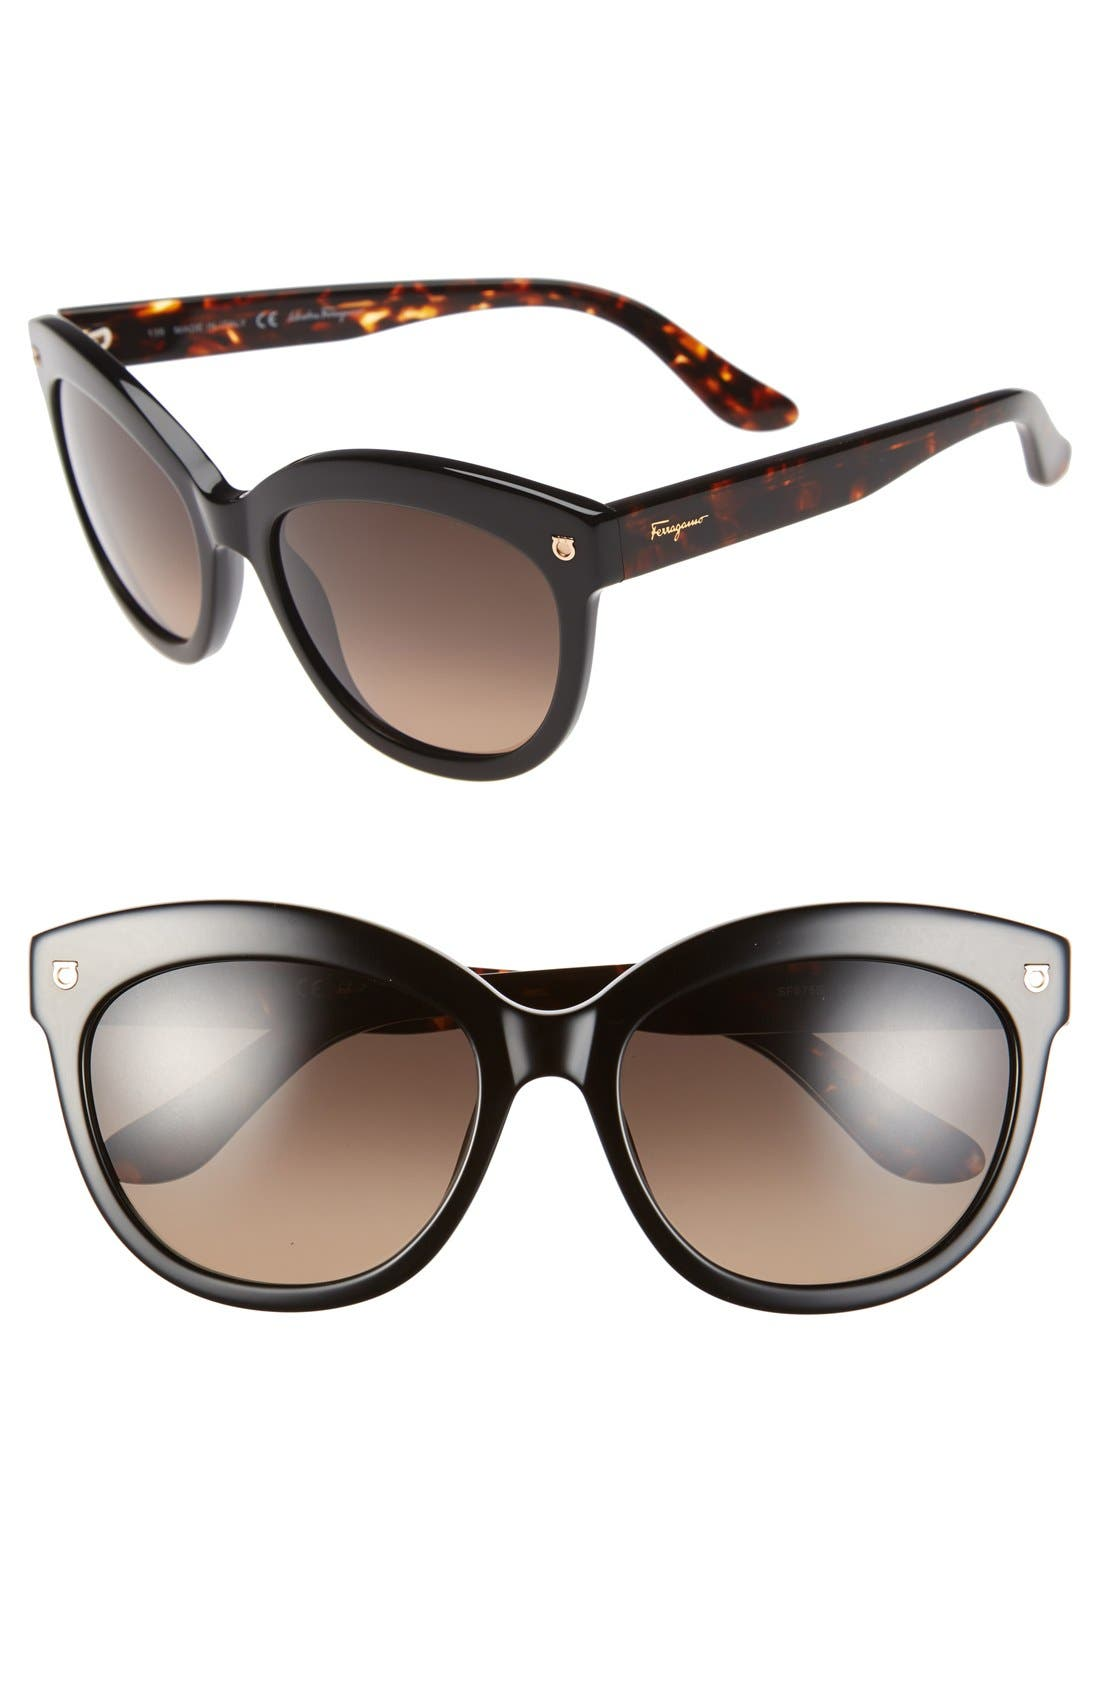 Alternate Image 1 Selected - Salvatore Ferragamo 'Gancino' 55mm Cat Eye Sunglasses